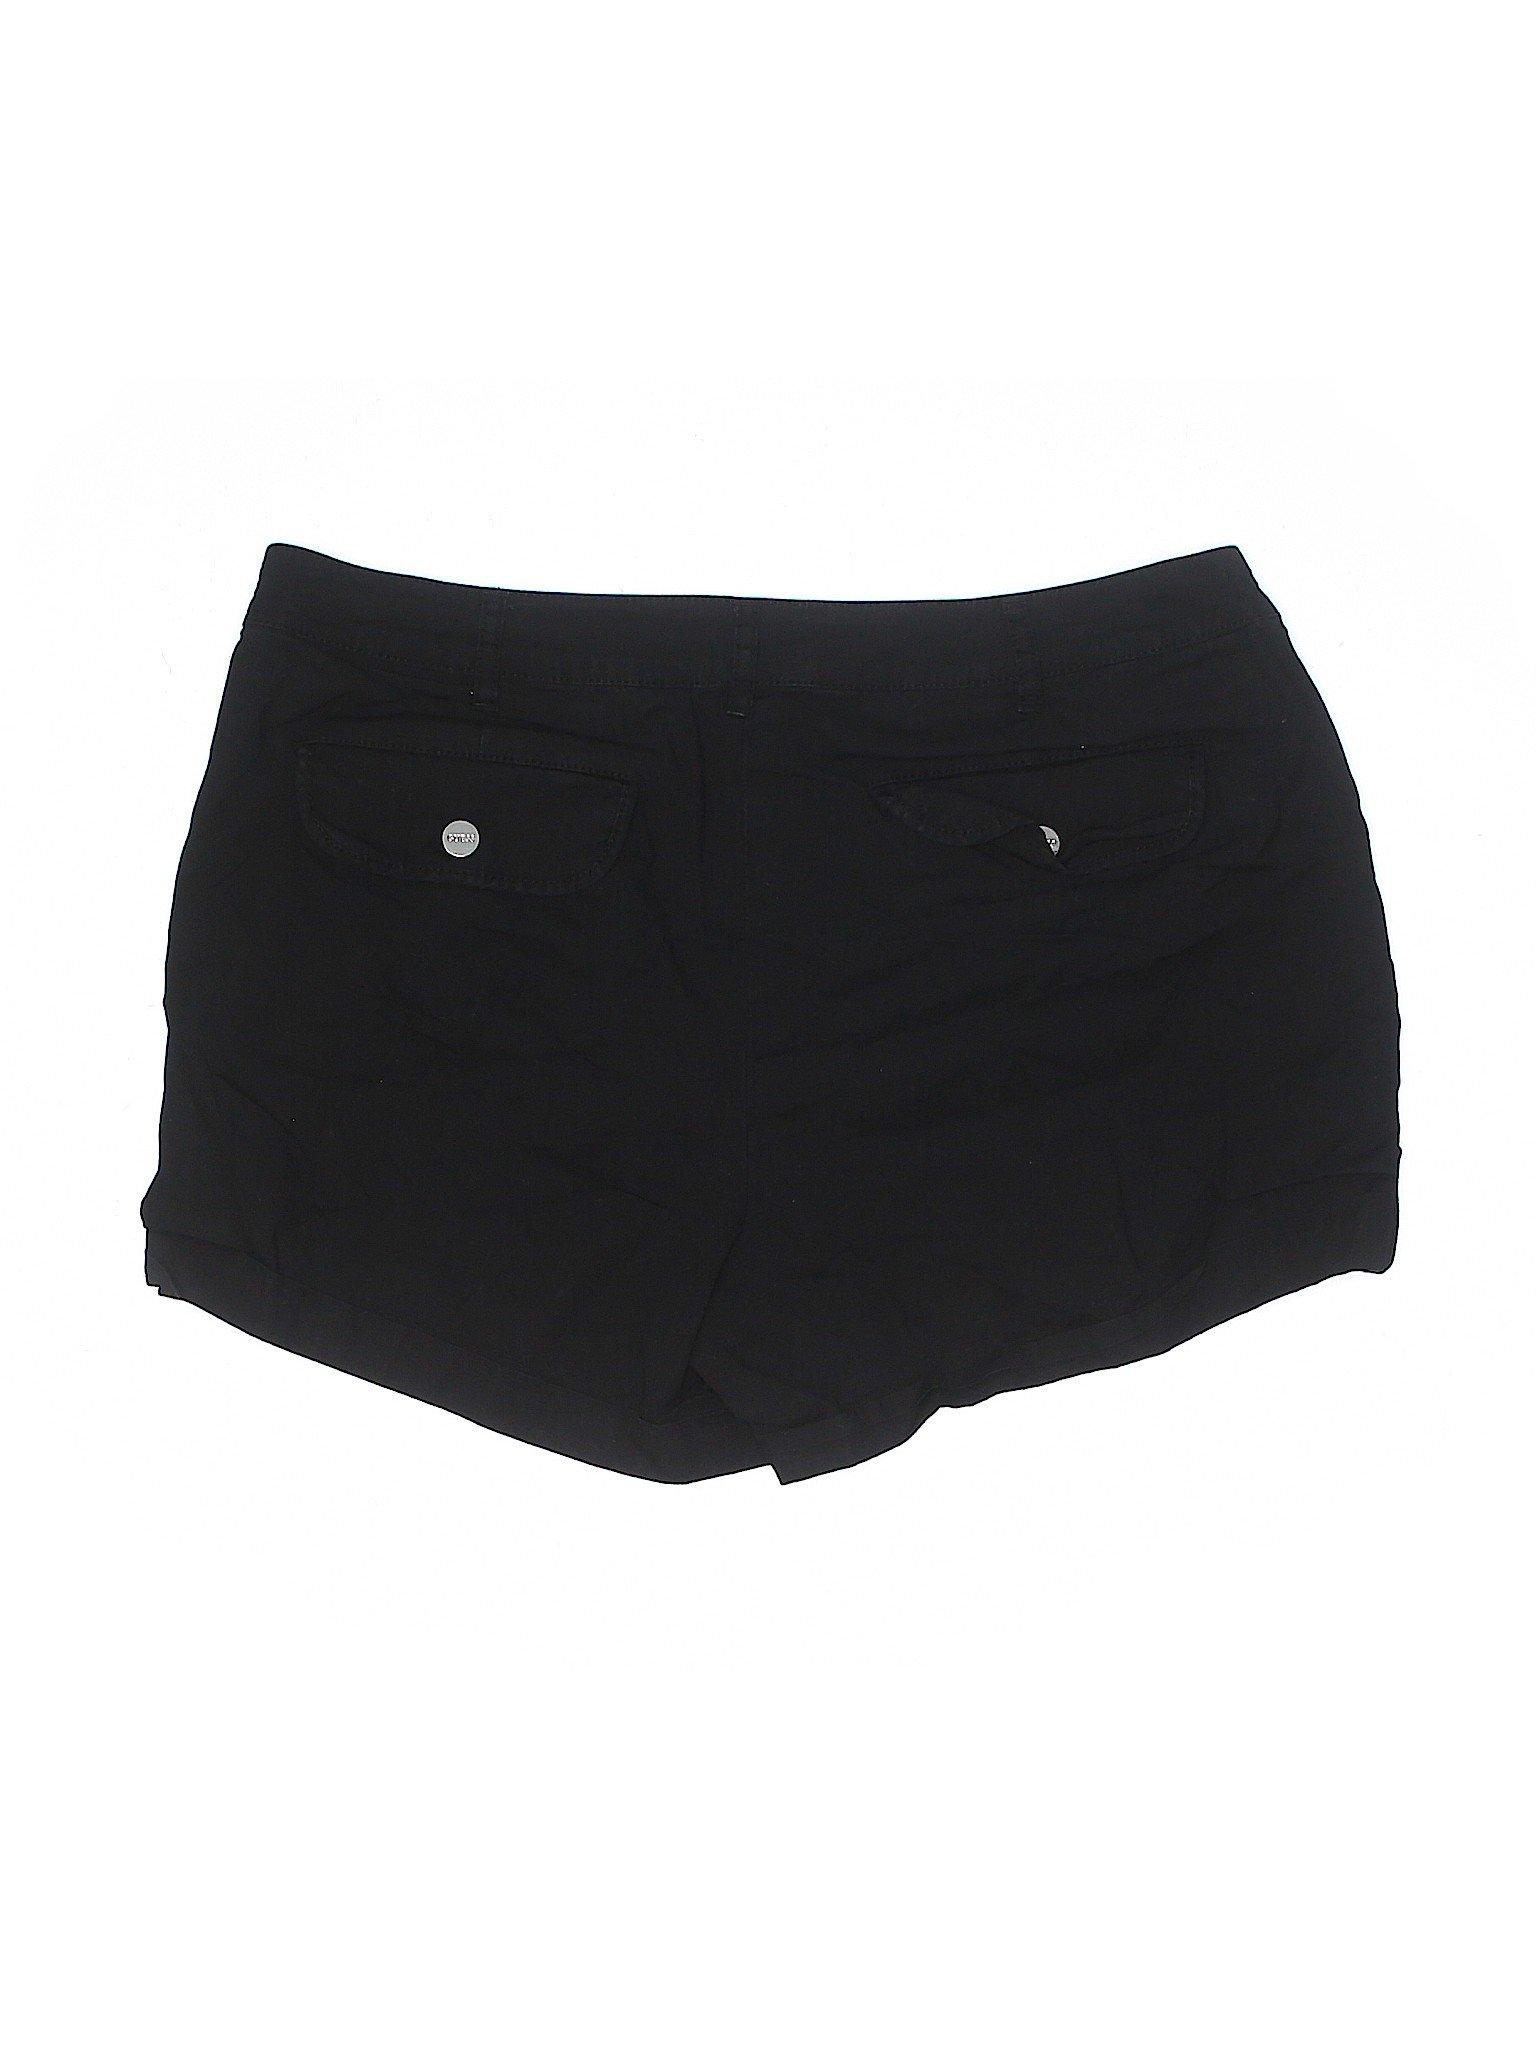 Boutique Guess Khaki Shorts Shorts Khaki Boutique Boutique Khaki Guess Shorts Guess Khaki Boutique Guess 70qggR